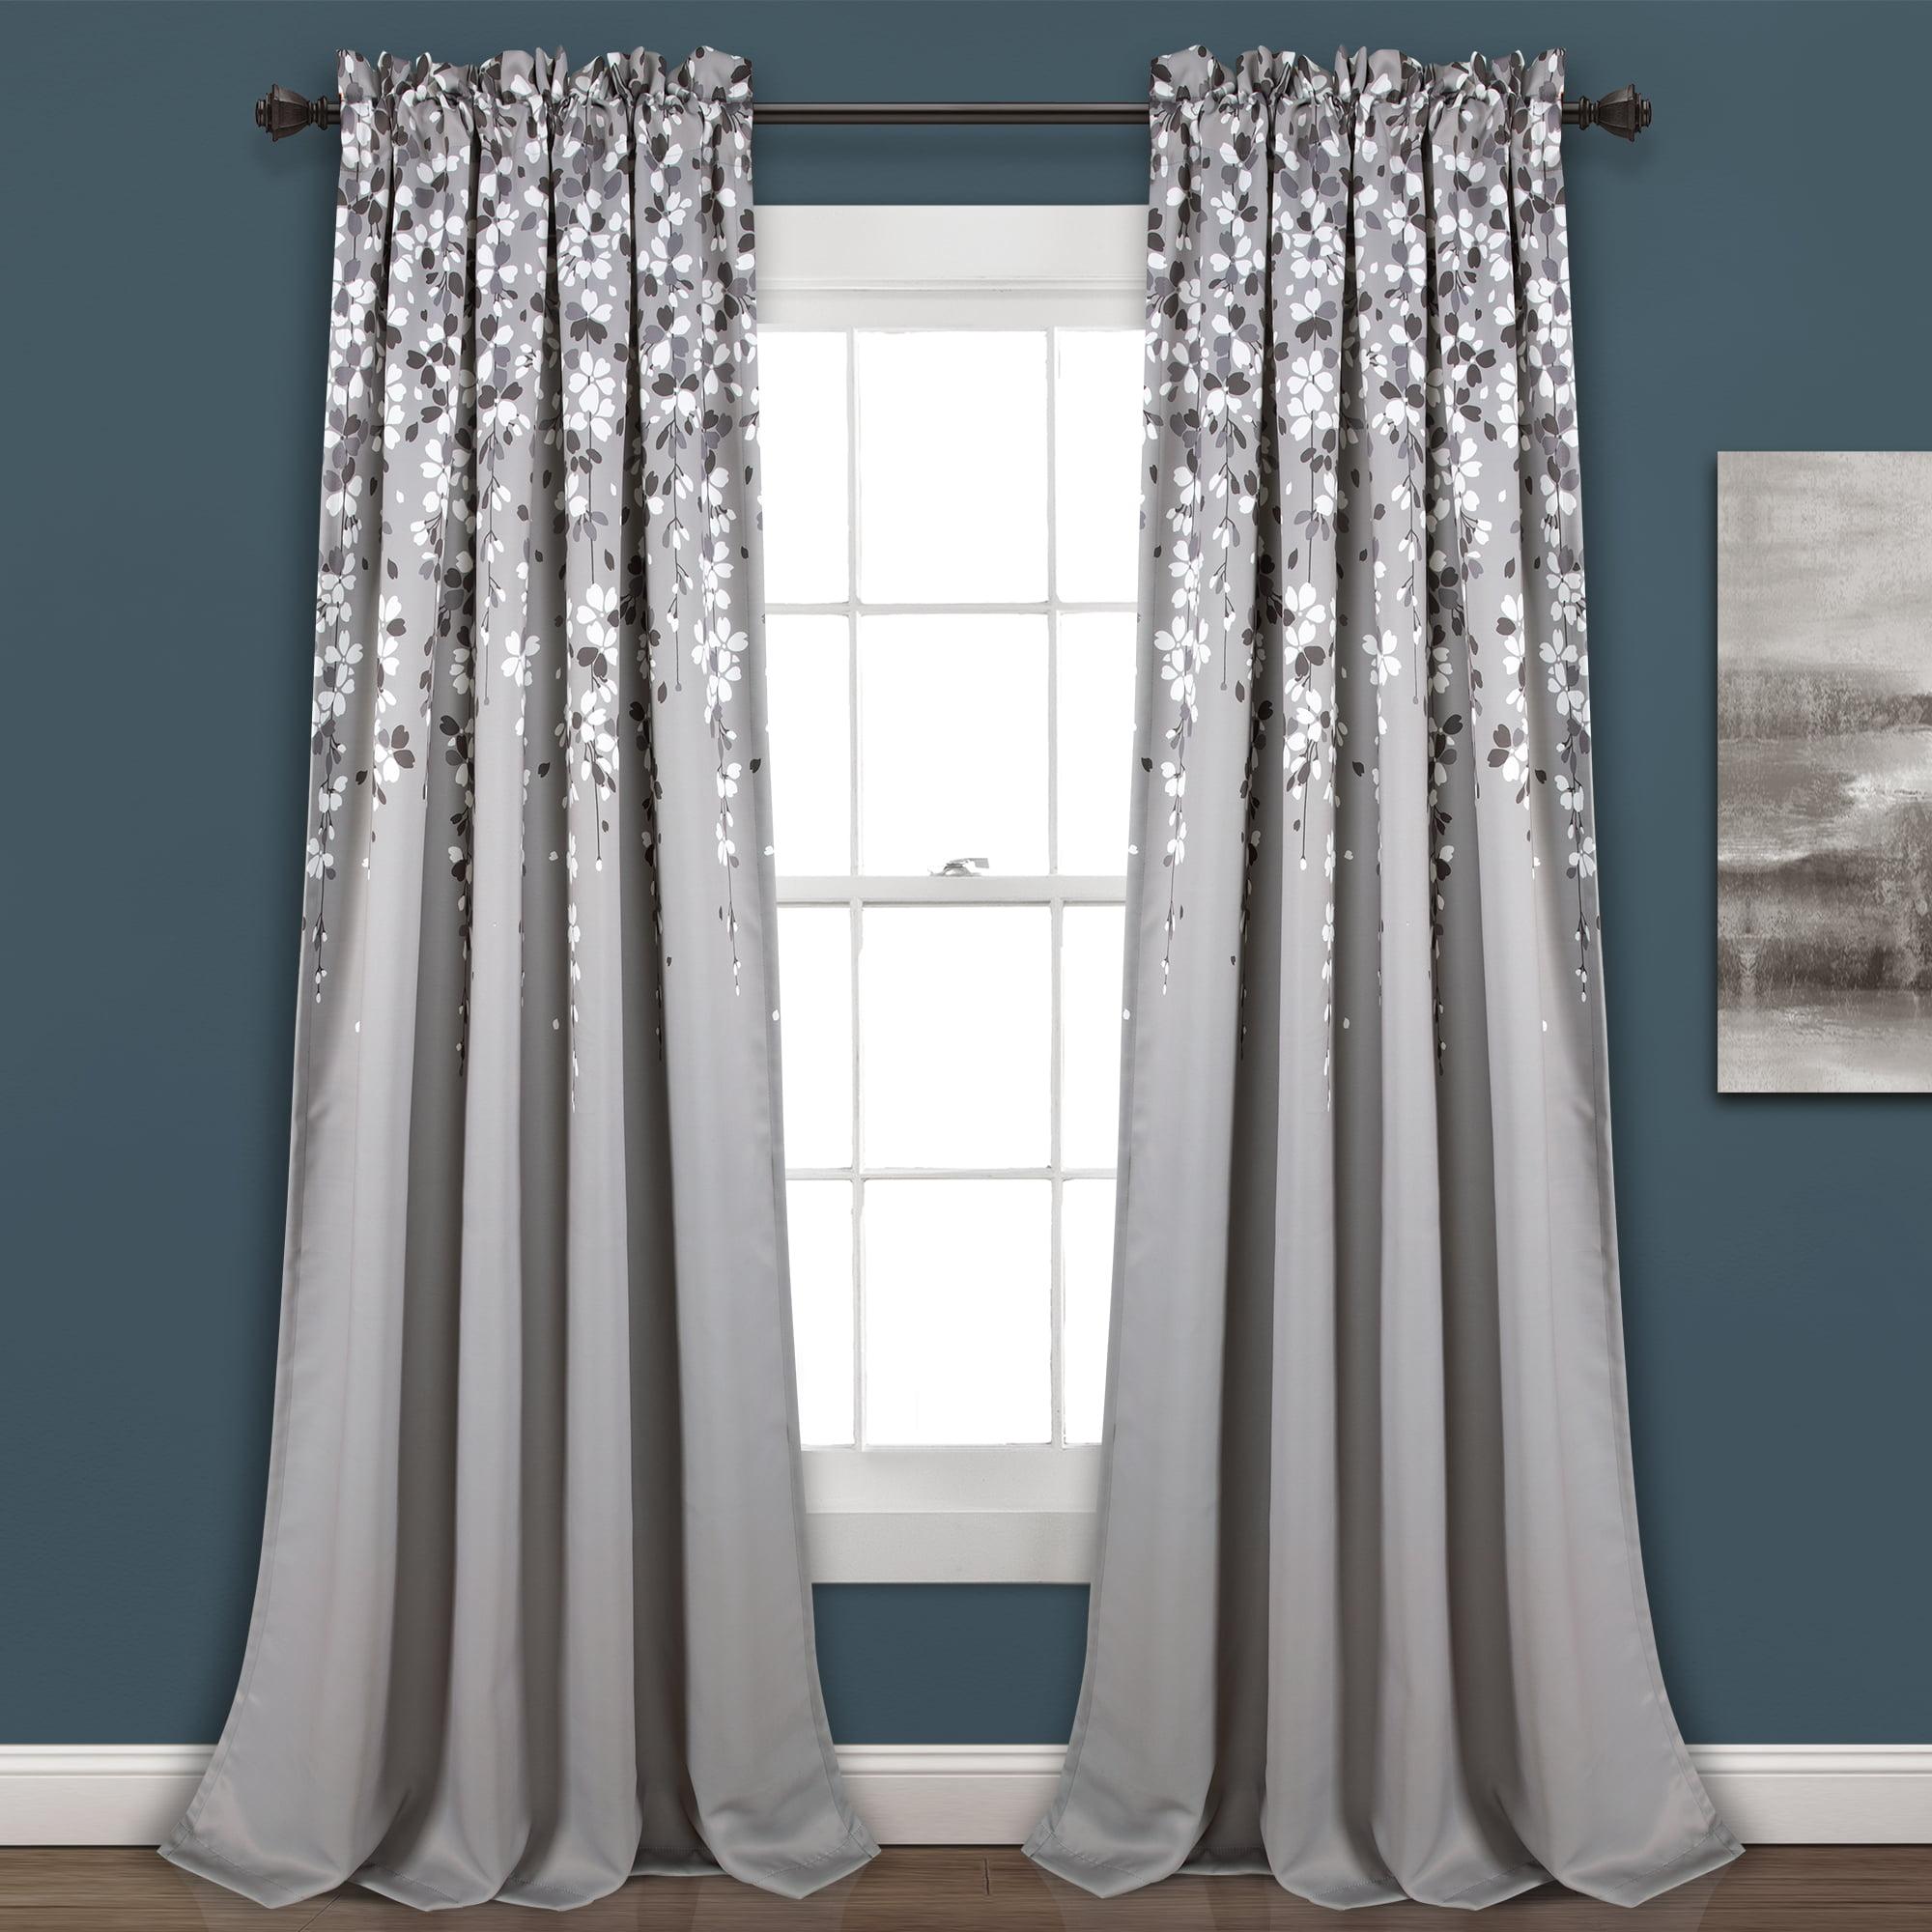 Weeping Flower Room Darkening Window Curtain Panels Gray